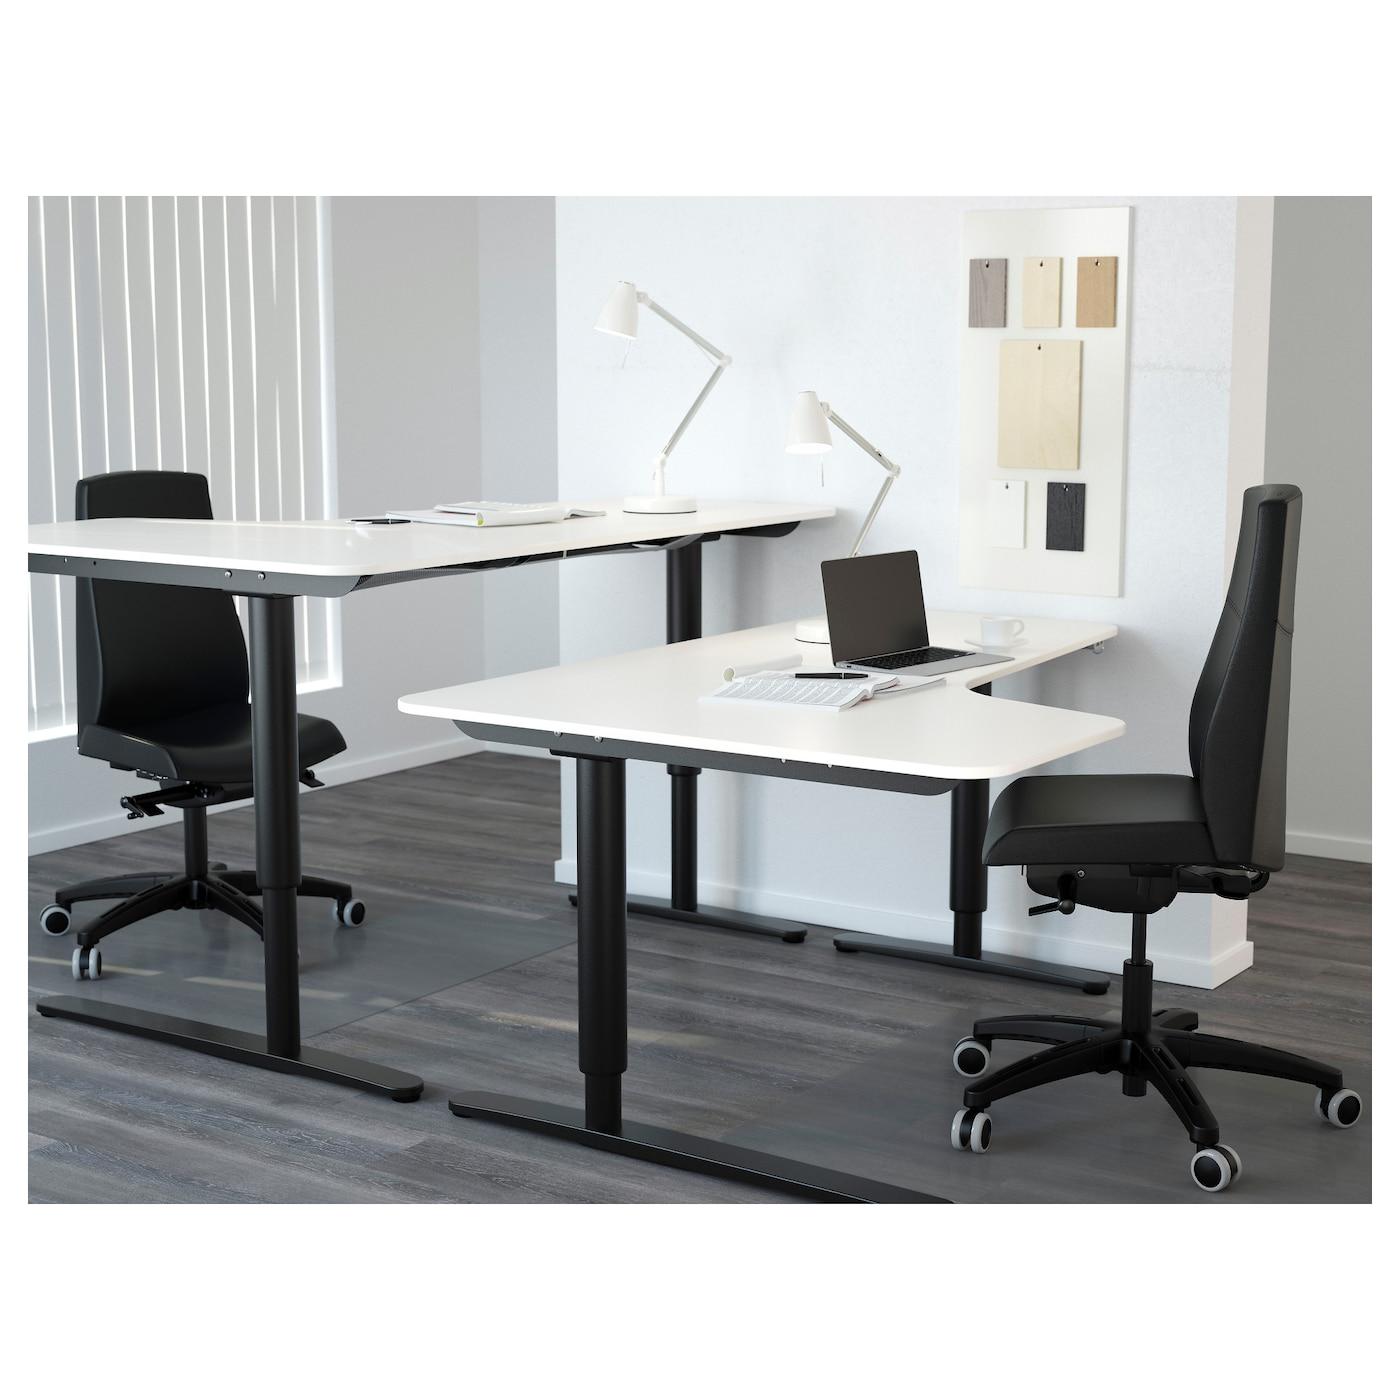 bekant left hand corner table top white 160 x 110 cm ikea. Black Bedroom Furniture Sets. Home Design Ideas